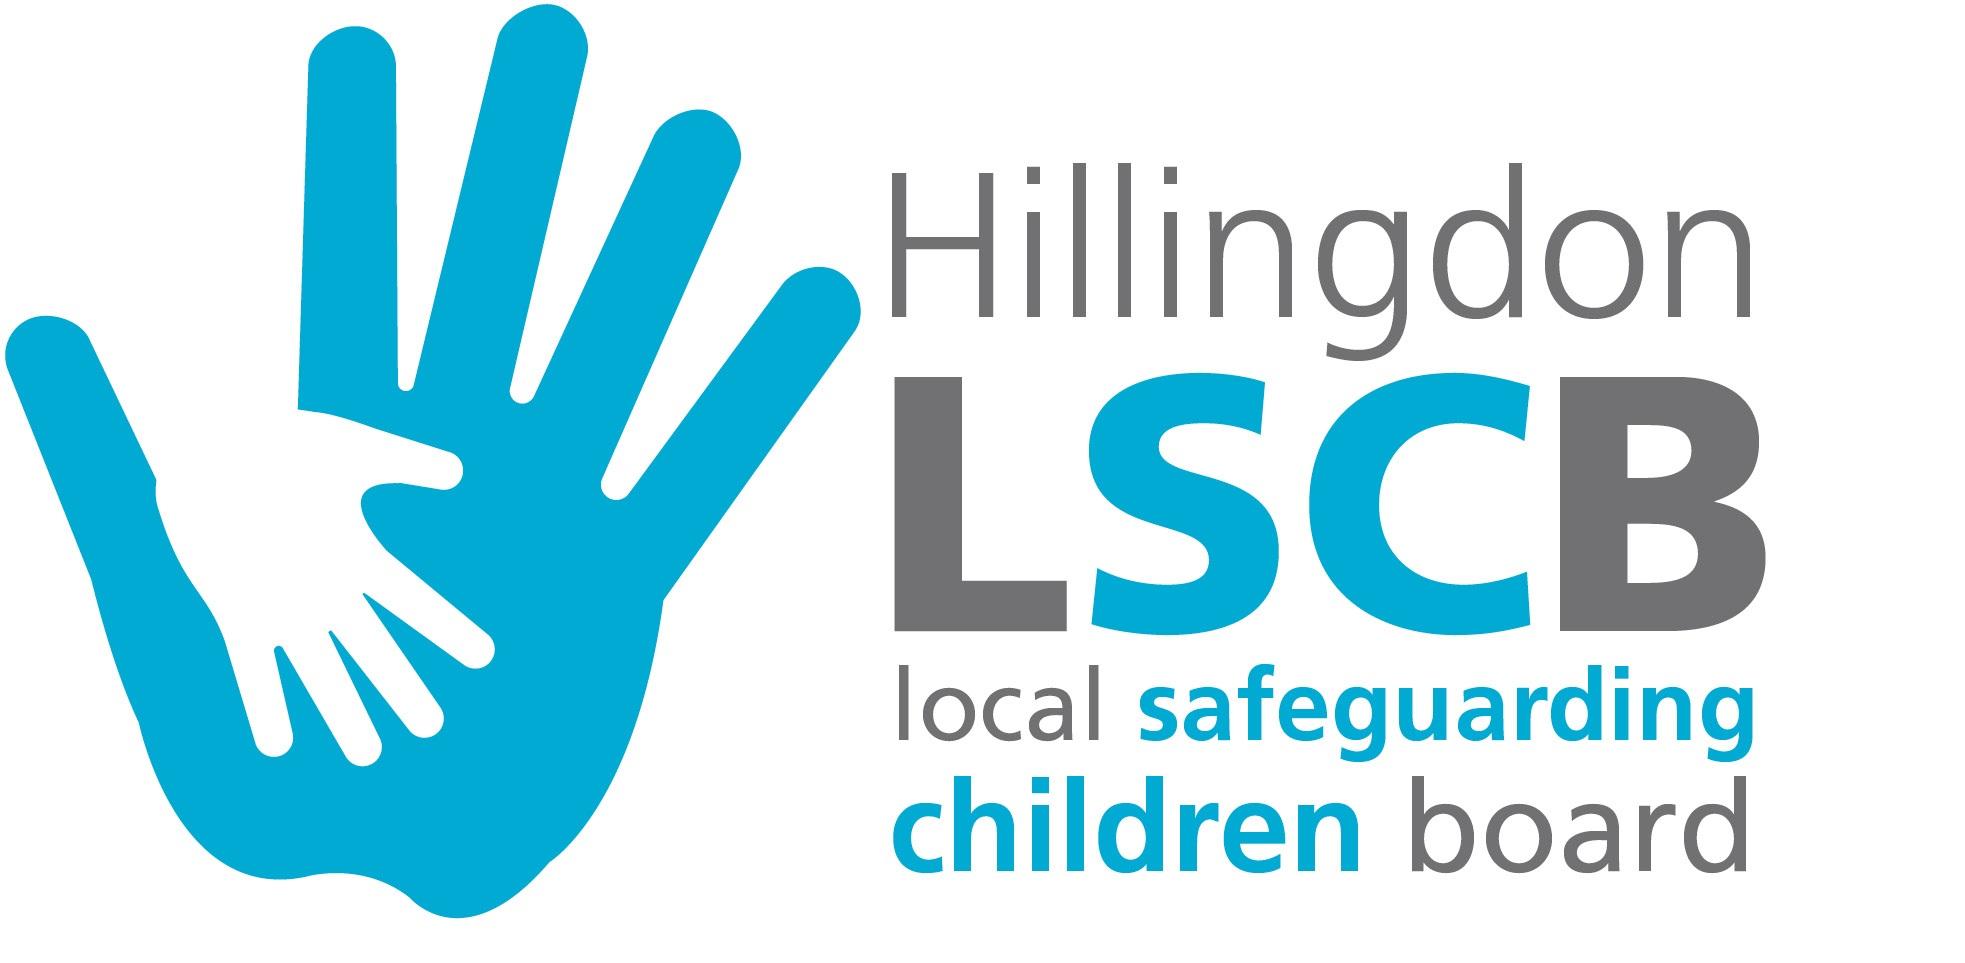 logo-hillingdon-local-safeguarding-children-board.jpg